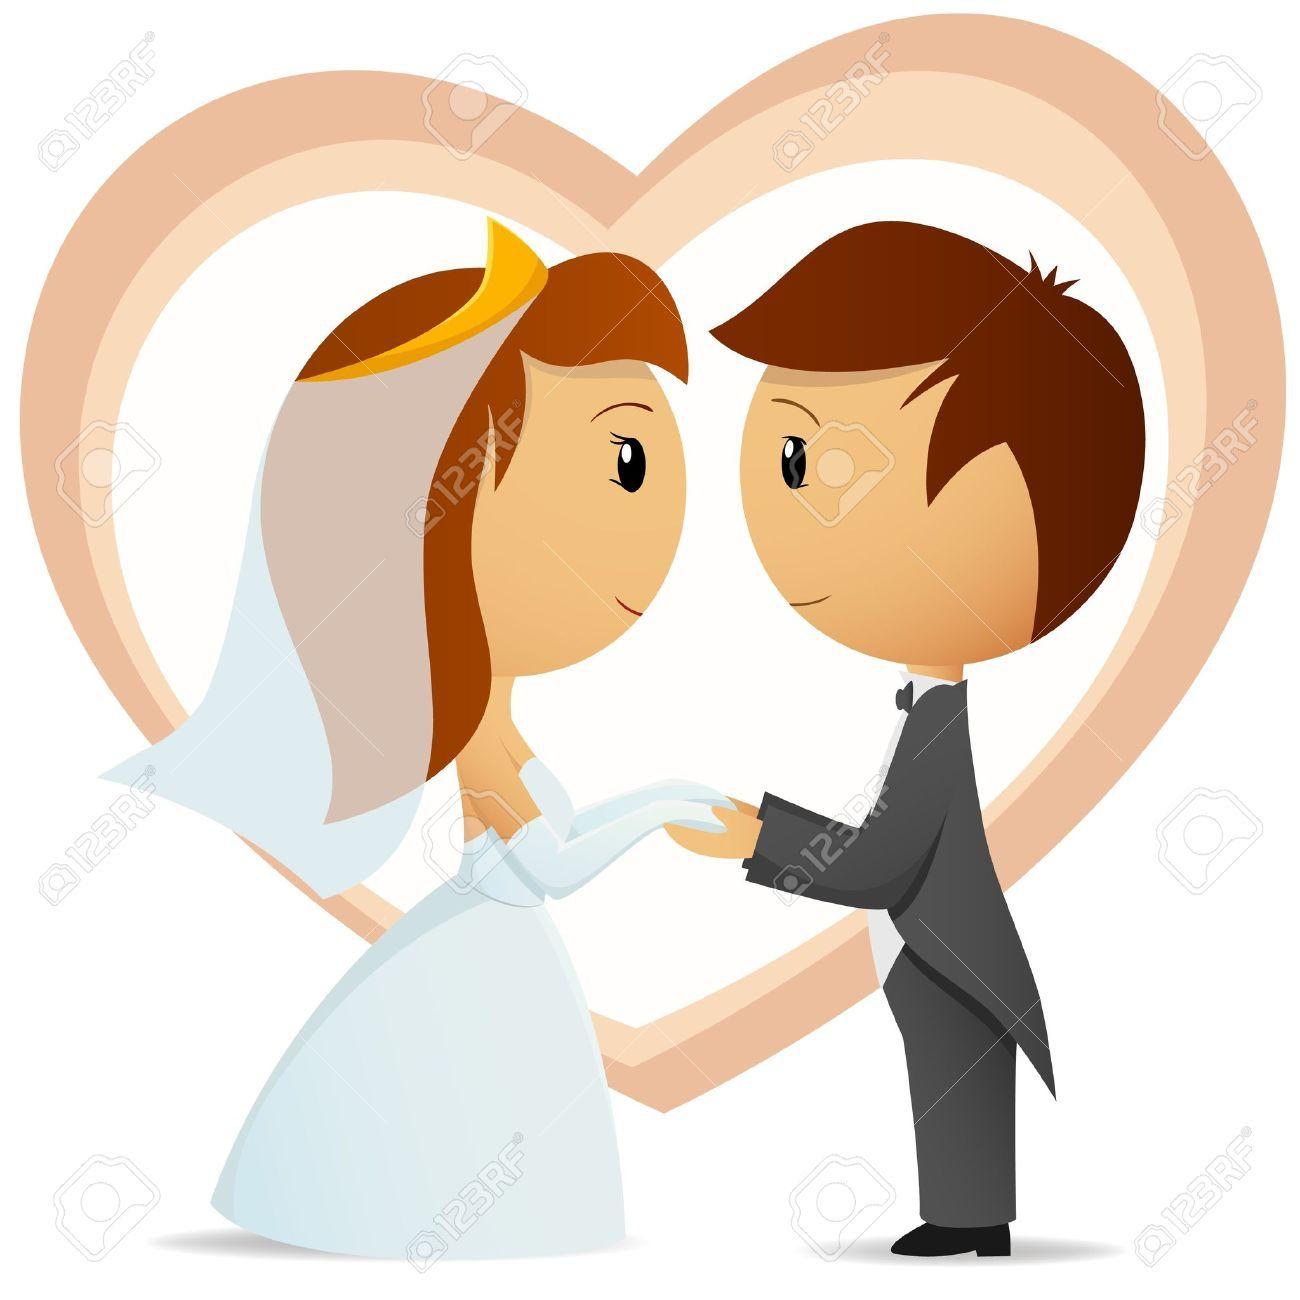 Resultado De Imagen De Novios Contador Animado Dibujos De Novios Caricaturas De Novios Matrimonio Dibujos